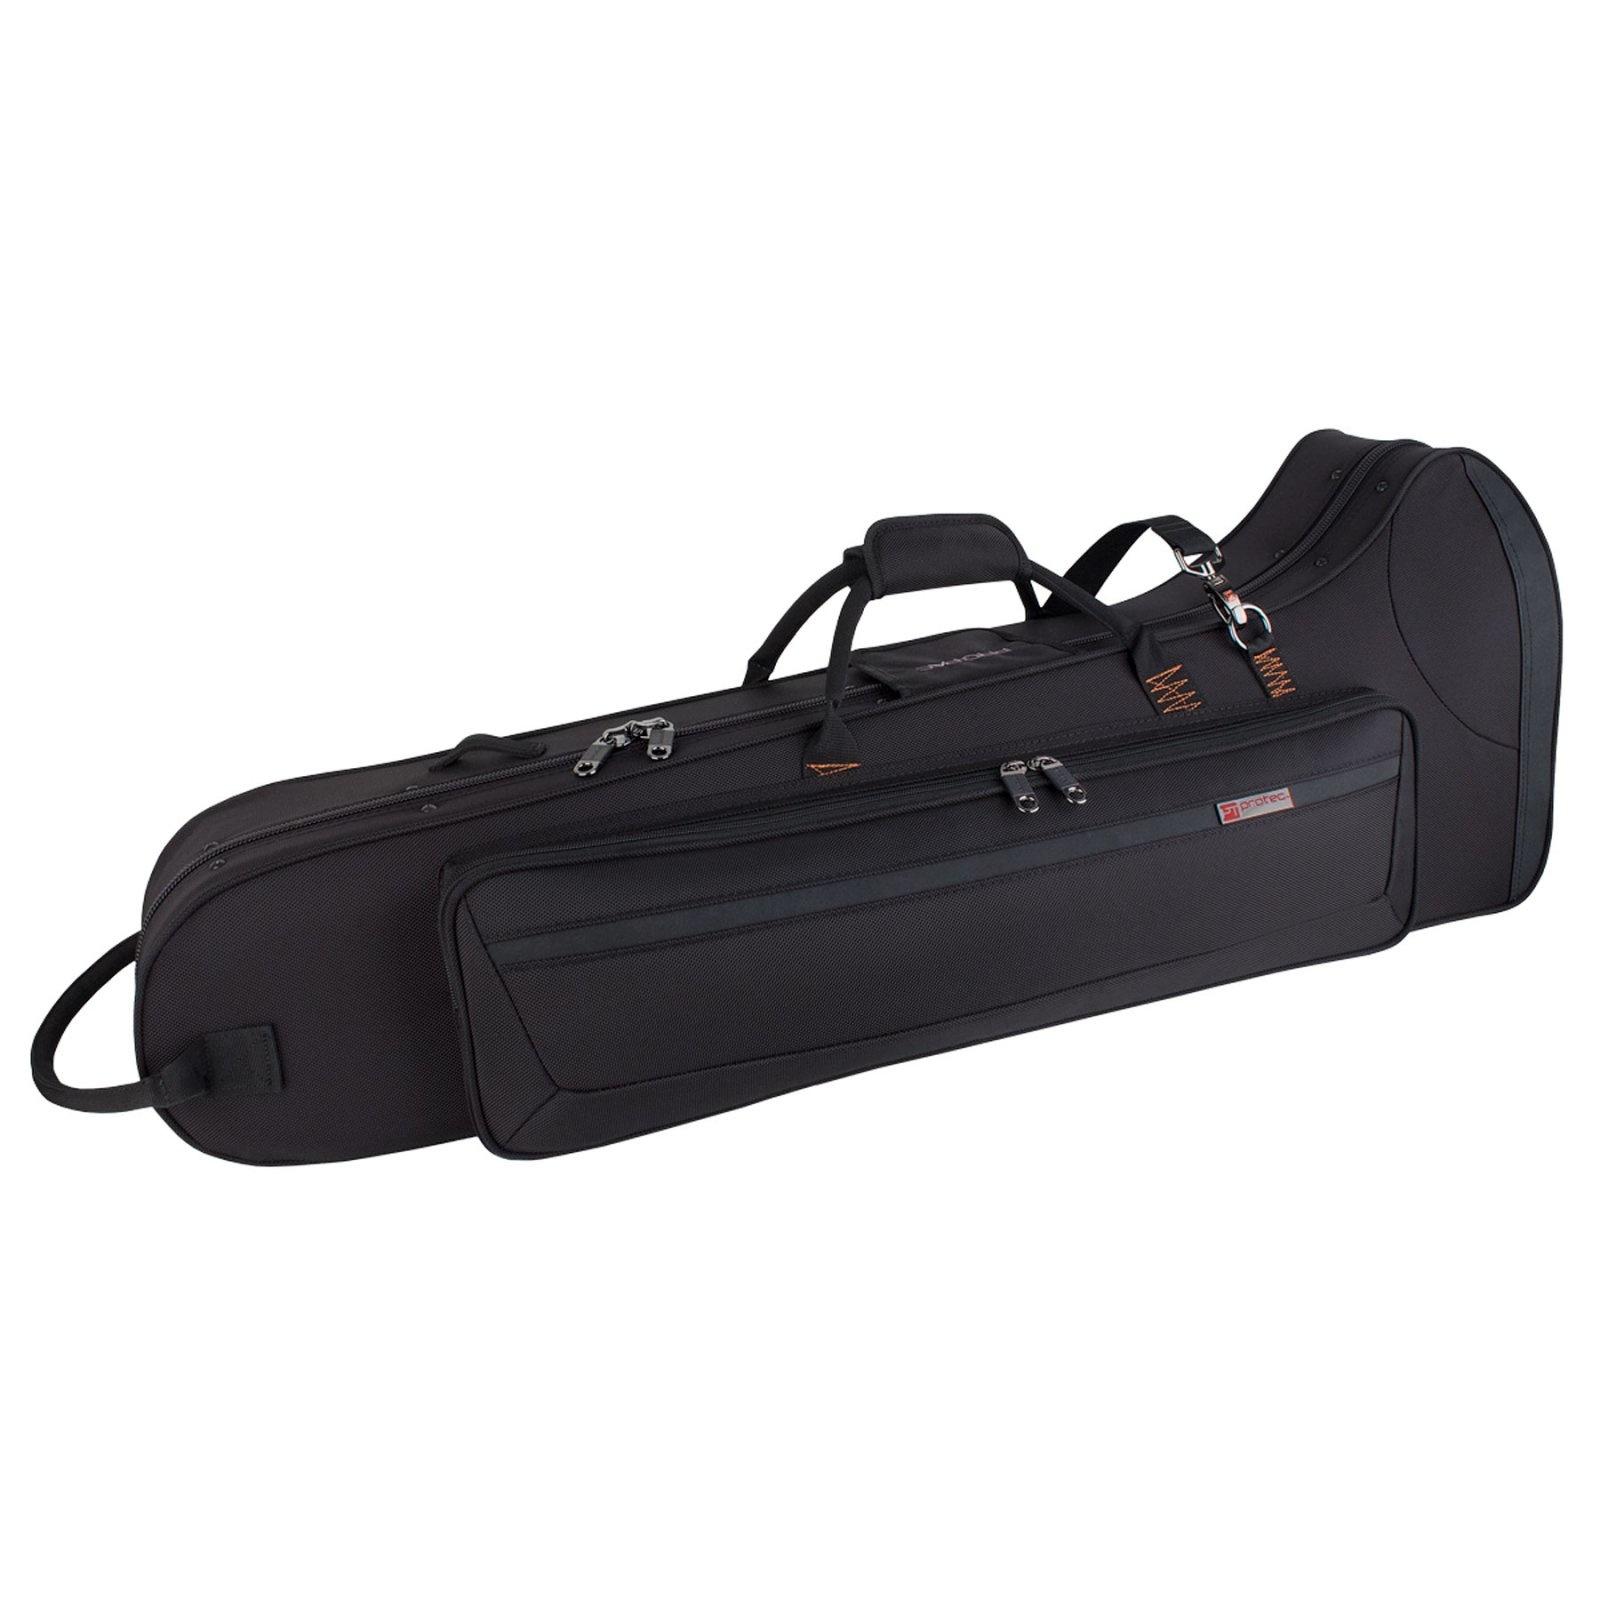 Protec Protec Pro Pac Tenor Trombone Case